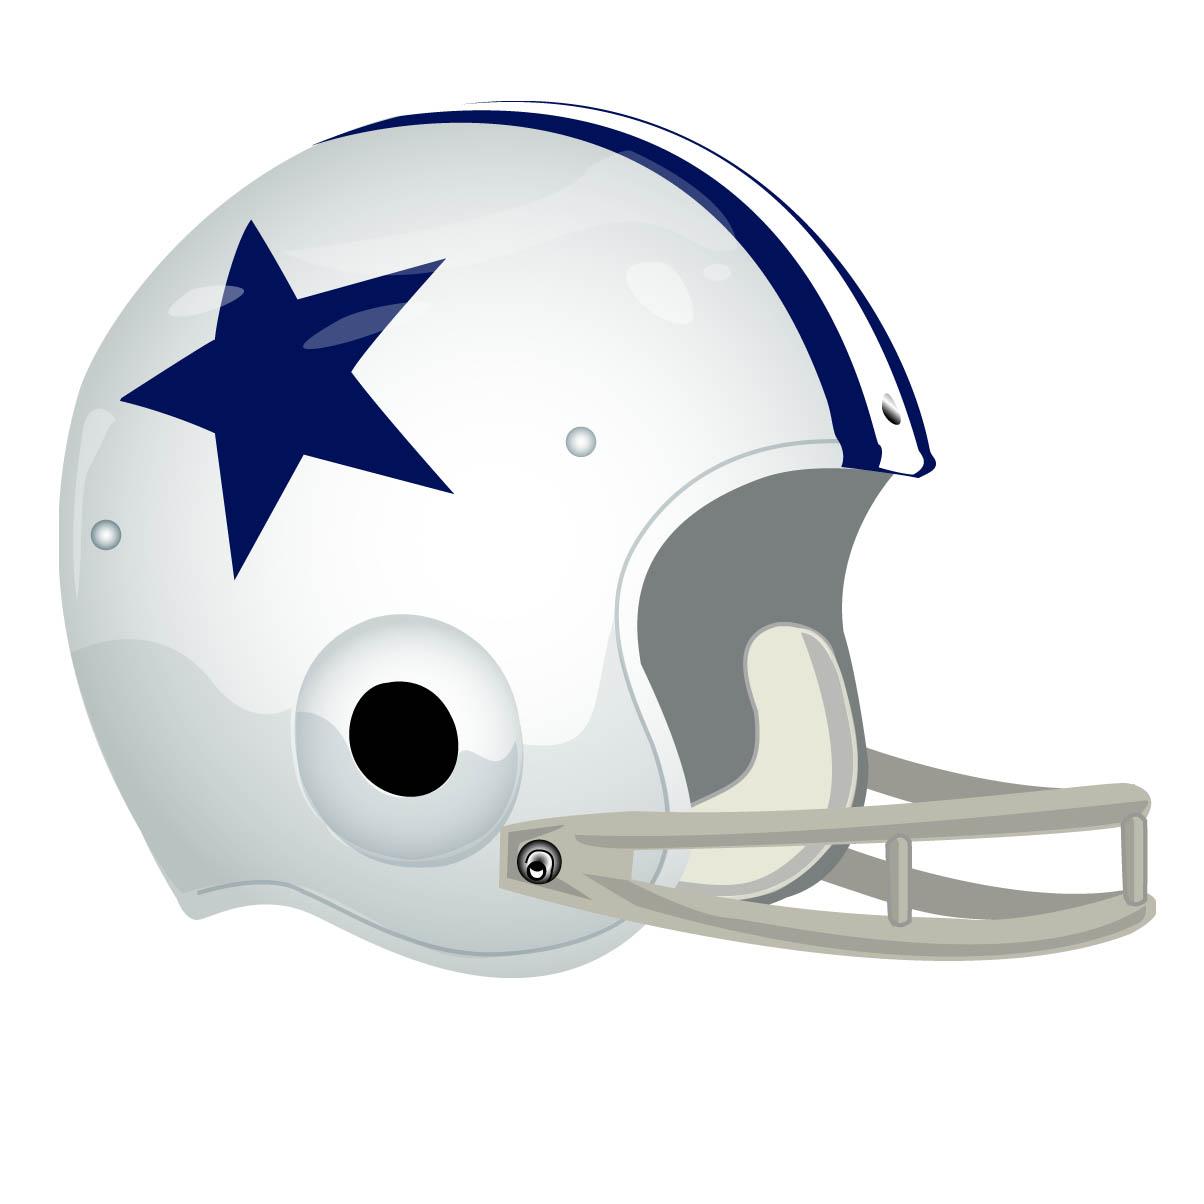 1204x1204 Filedallas Cowboys Helmet 1960.jpg